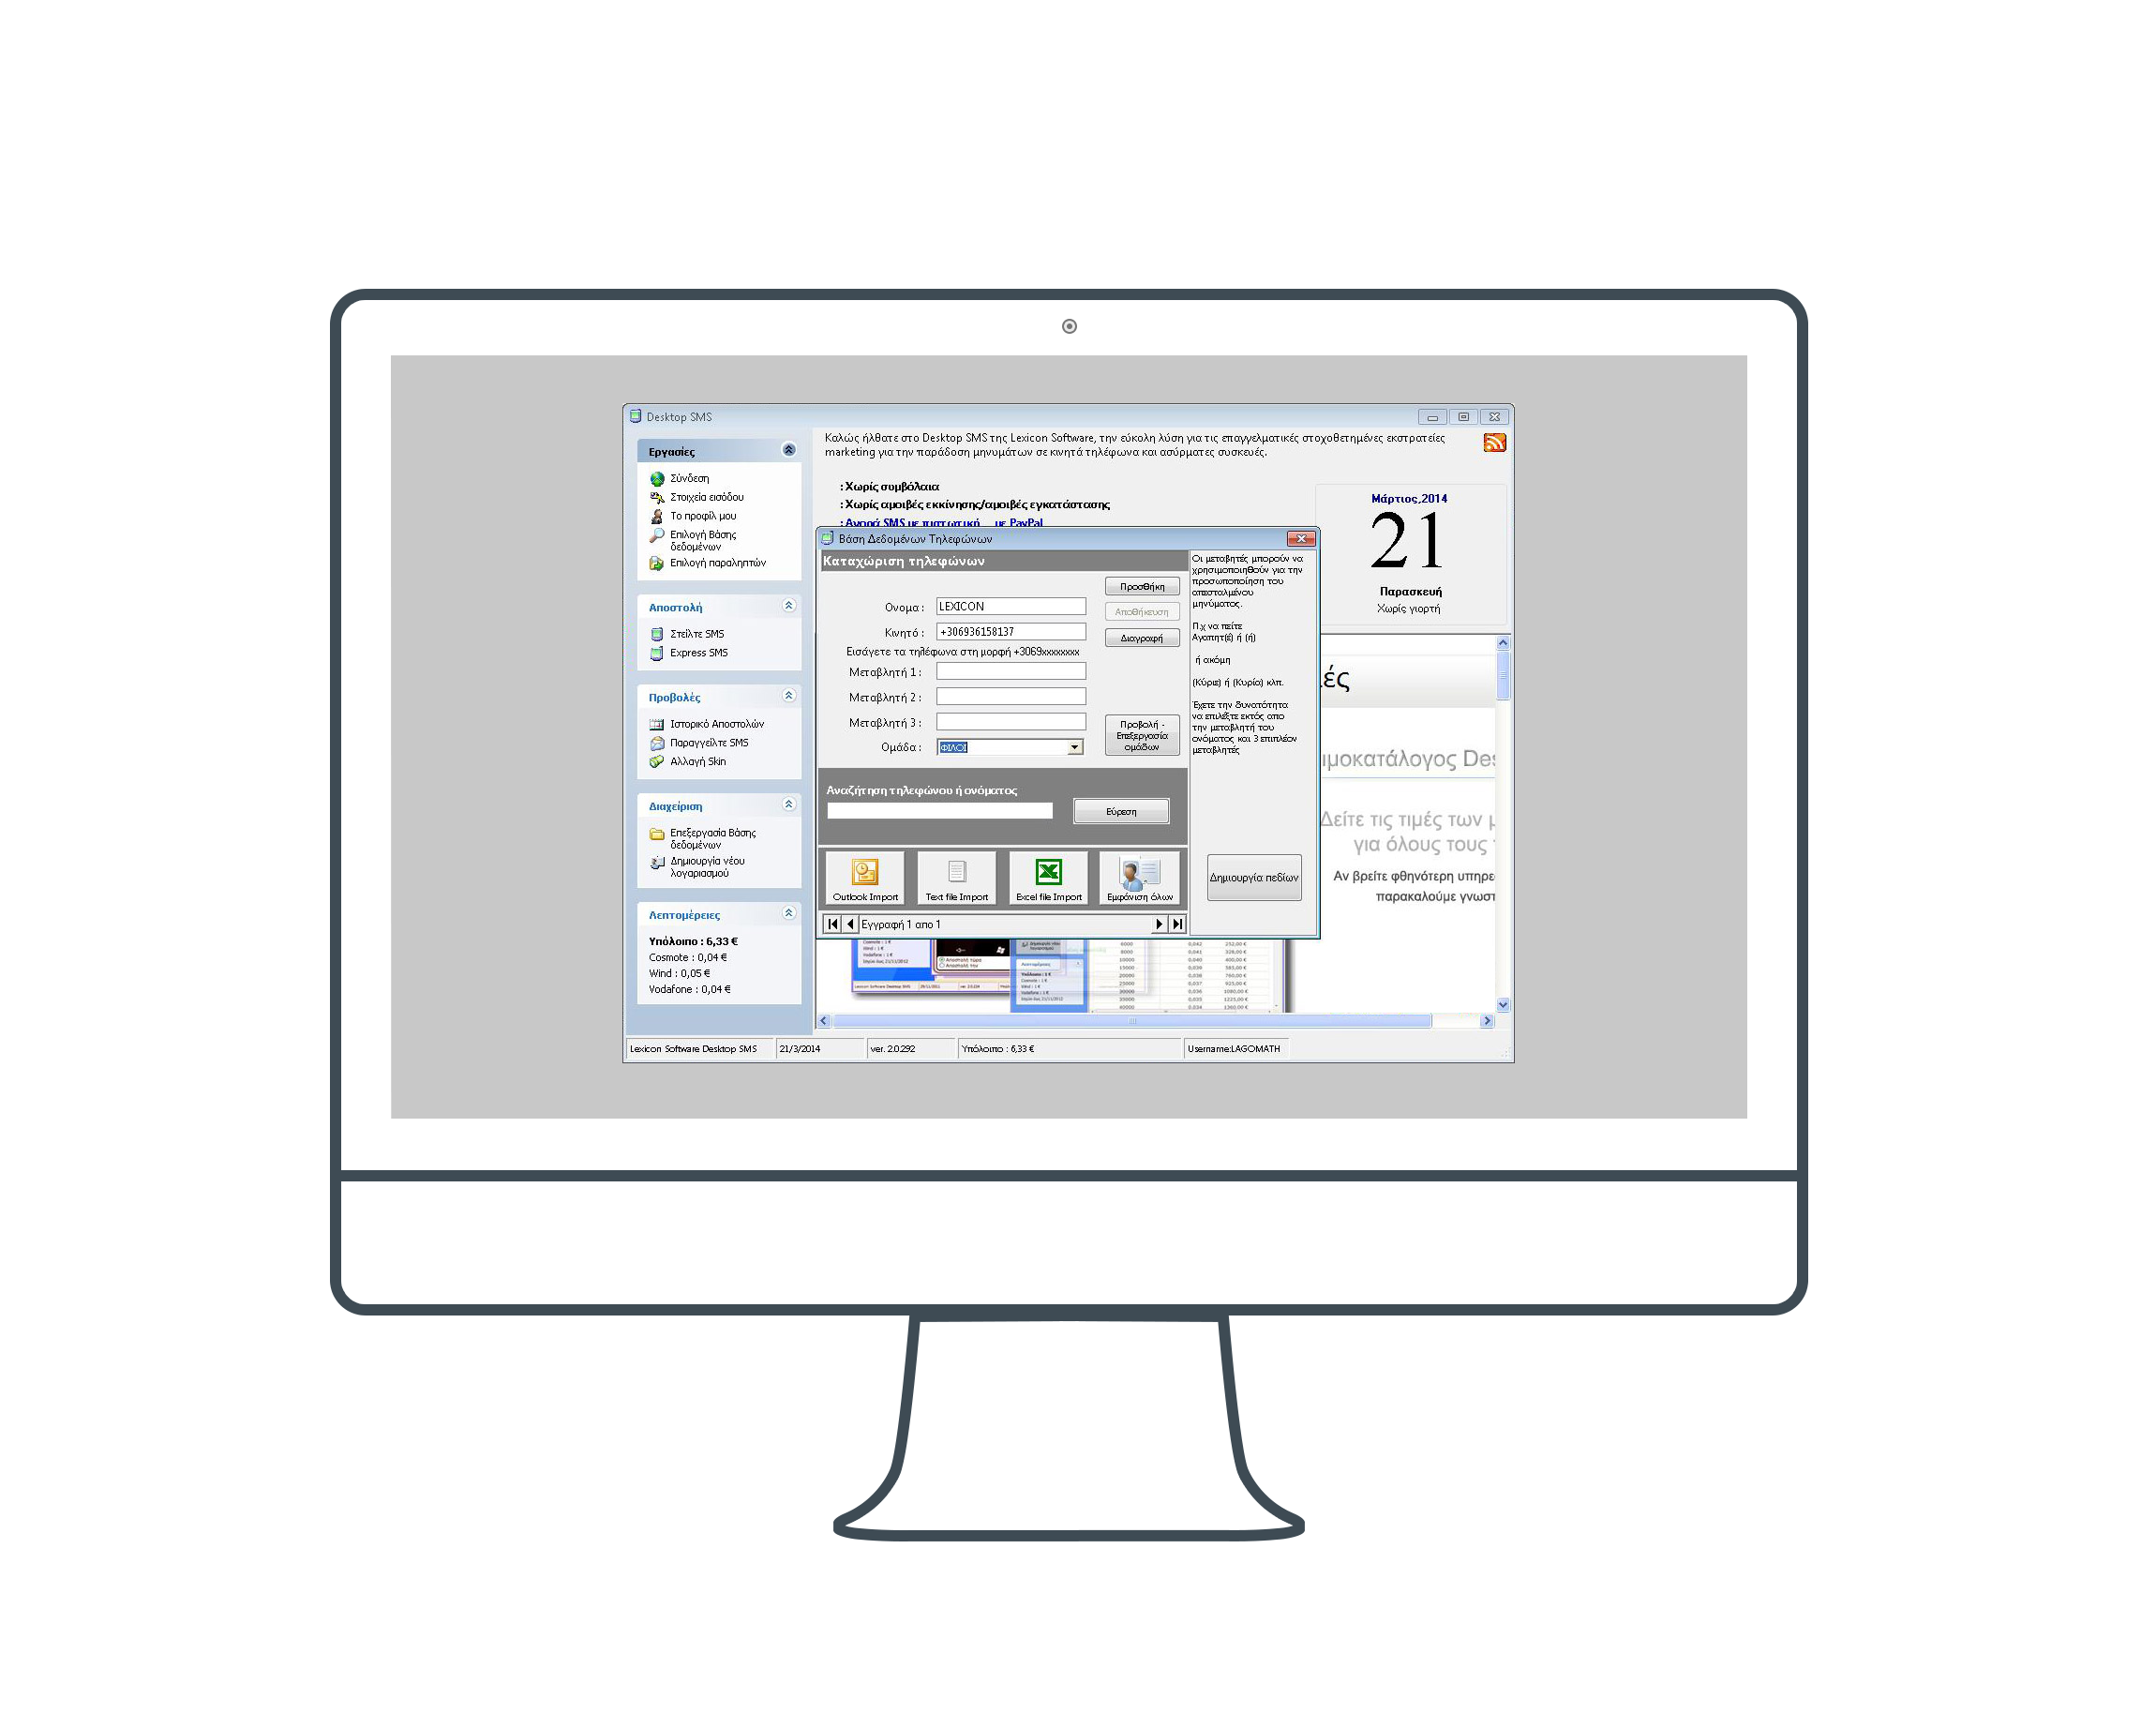 DesktopSMS | Ακόμη πιο χαμηλές τιμές